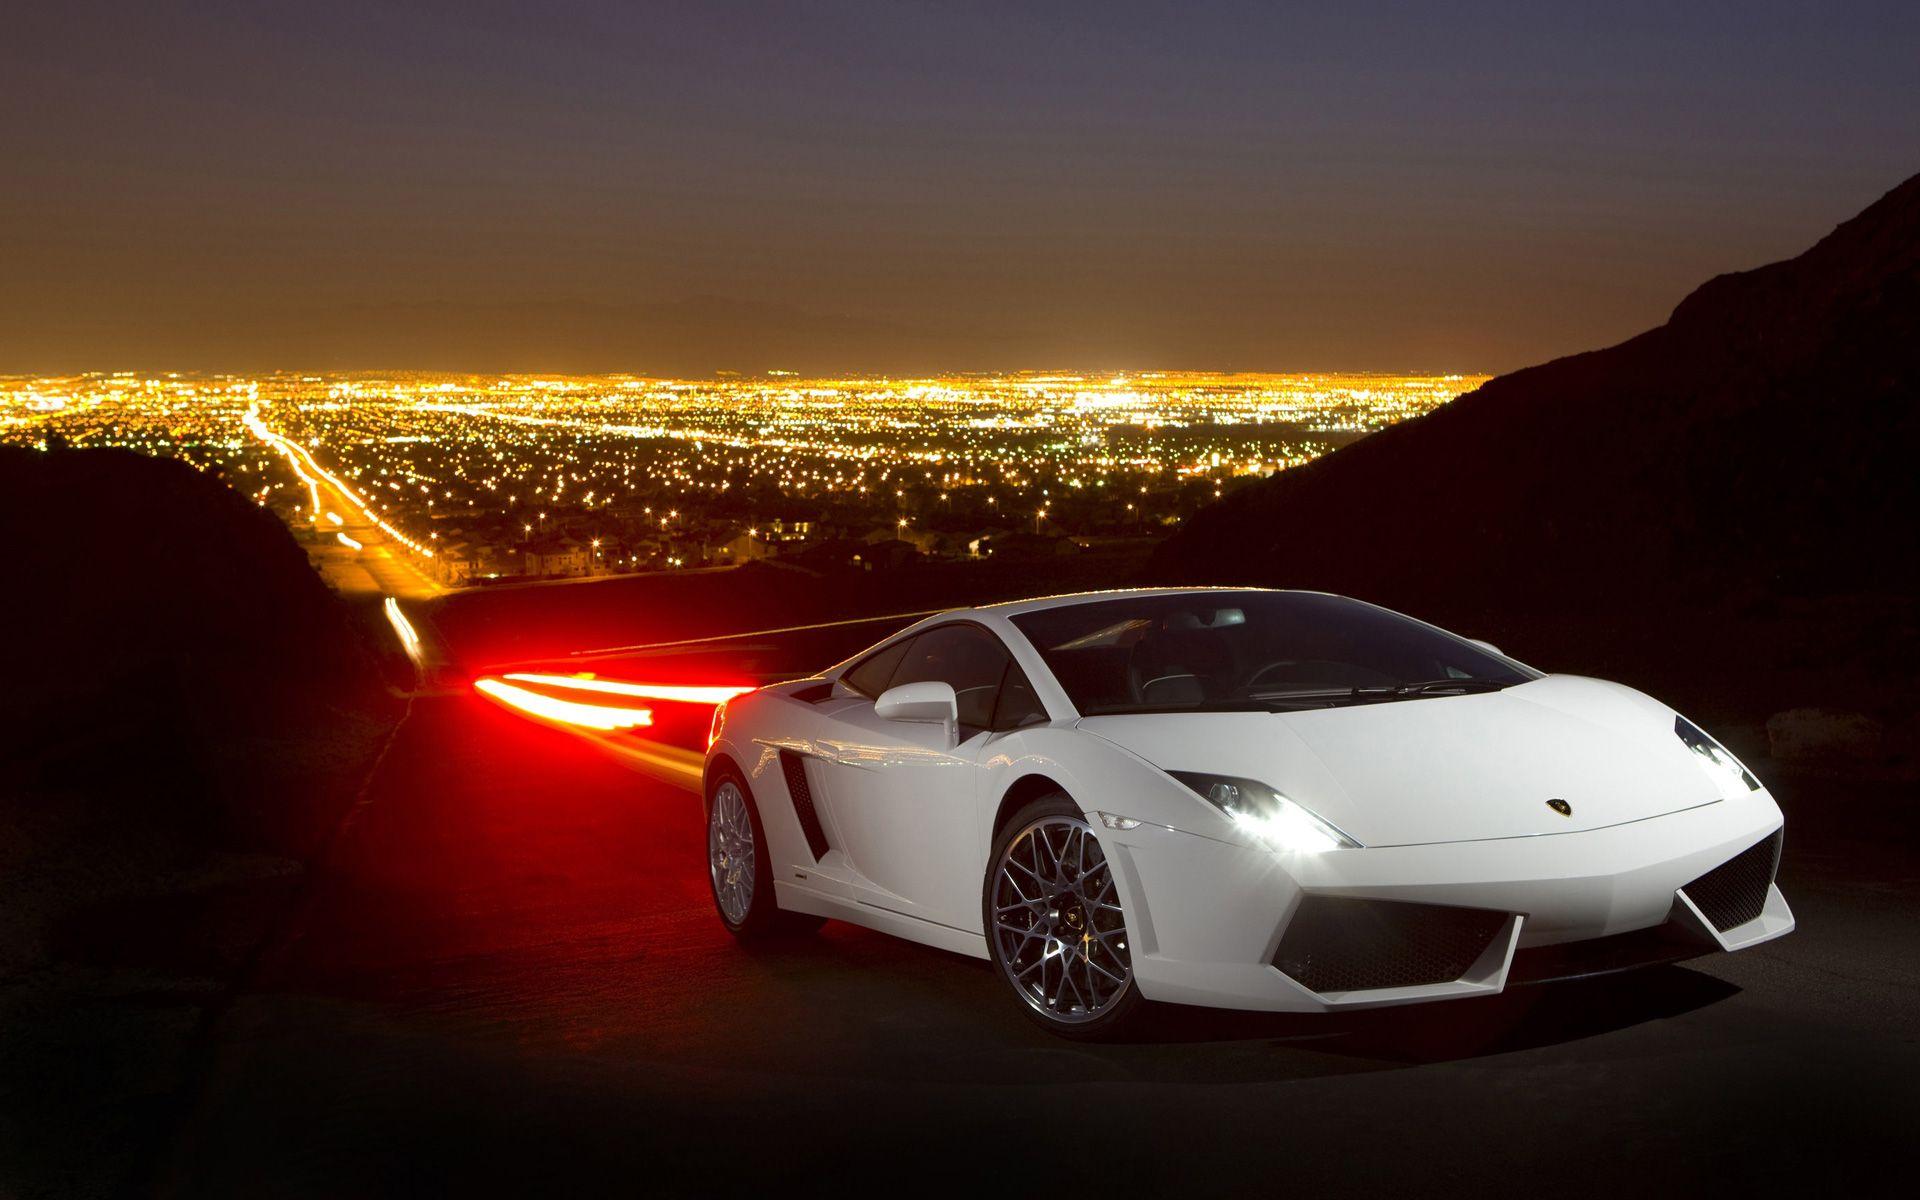 Lamborghini Gallardo LP560 4 Wallpaper | HD Car Wallpapers